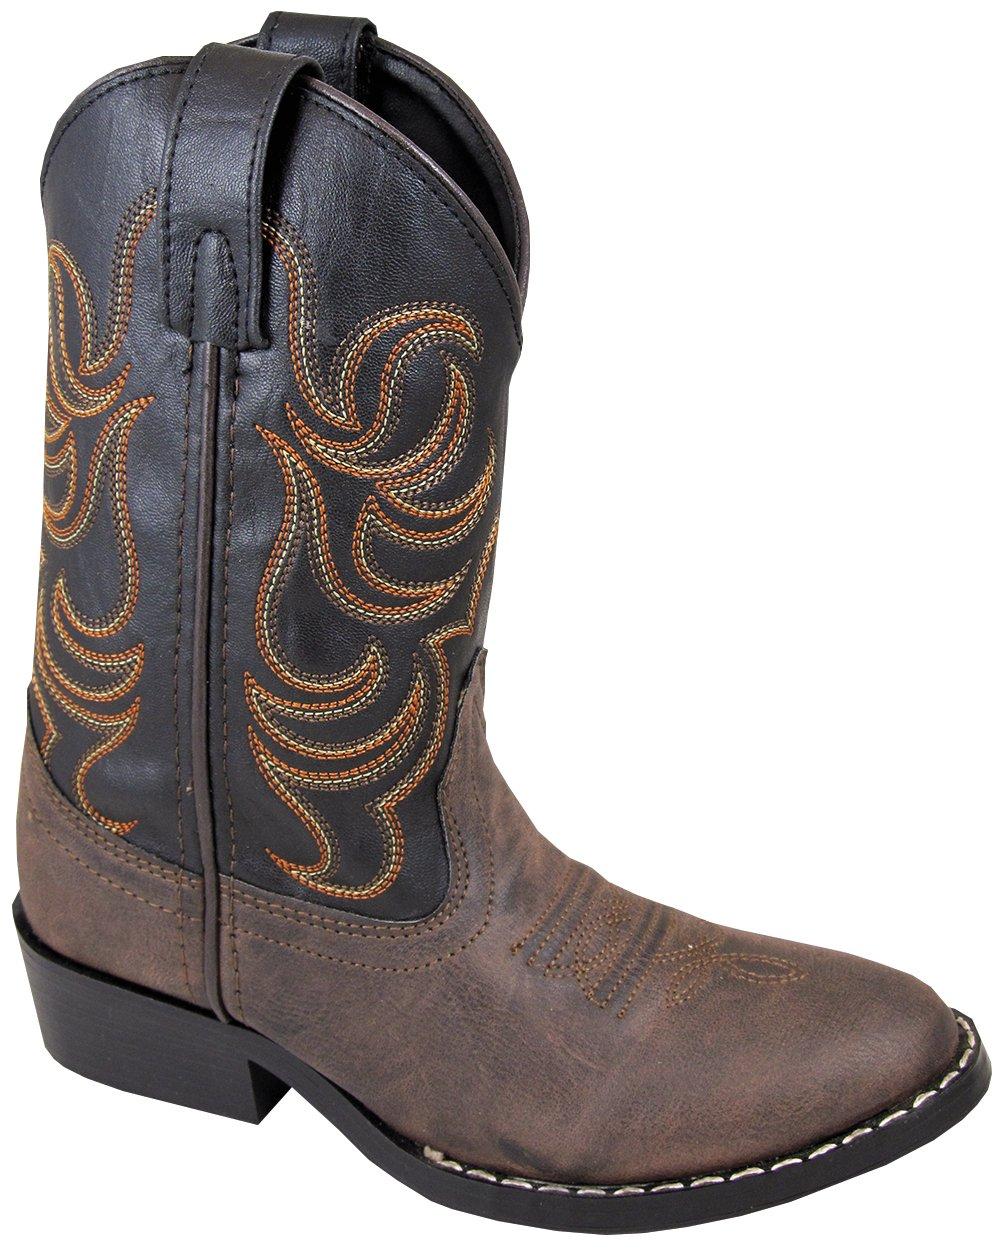 Smoky Mountain Children Boys Toddler Monterey Western Cowboy Boots Brown/Black, 10M